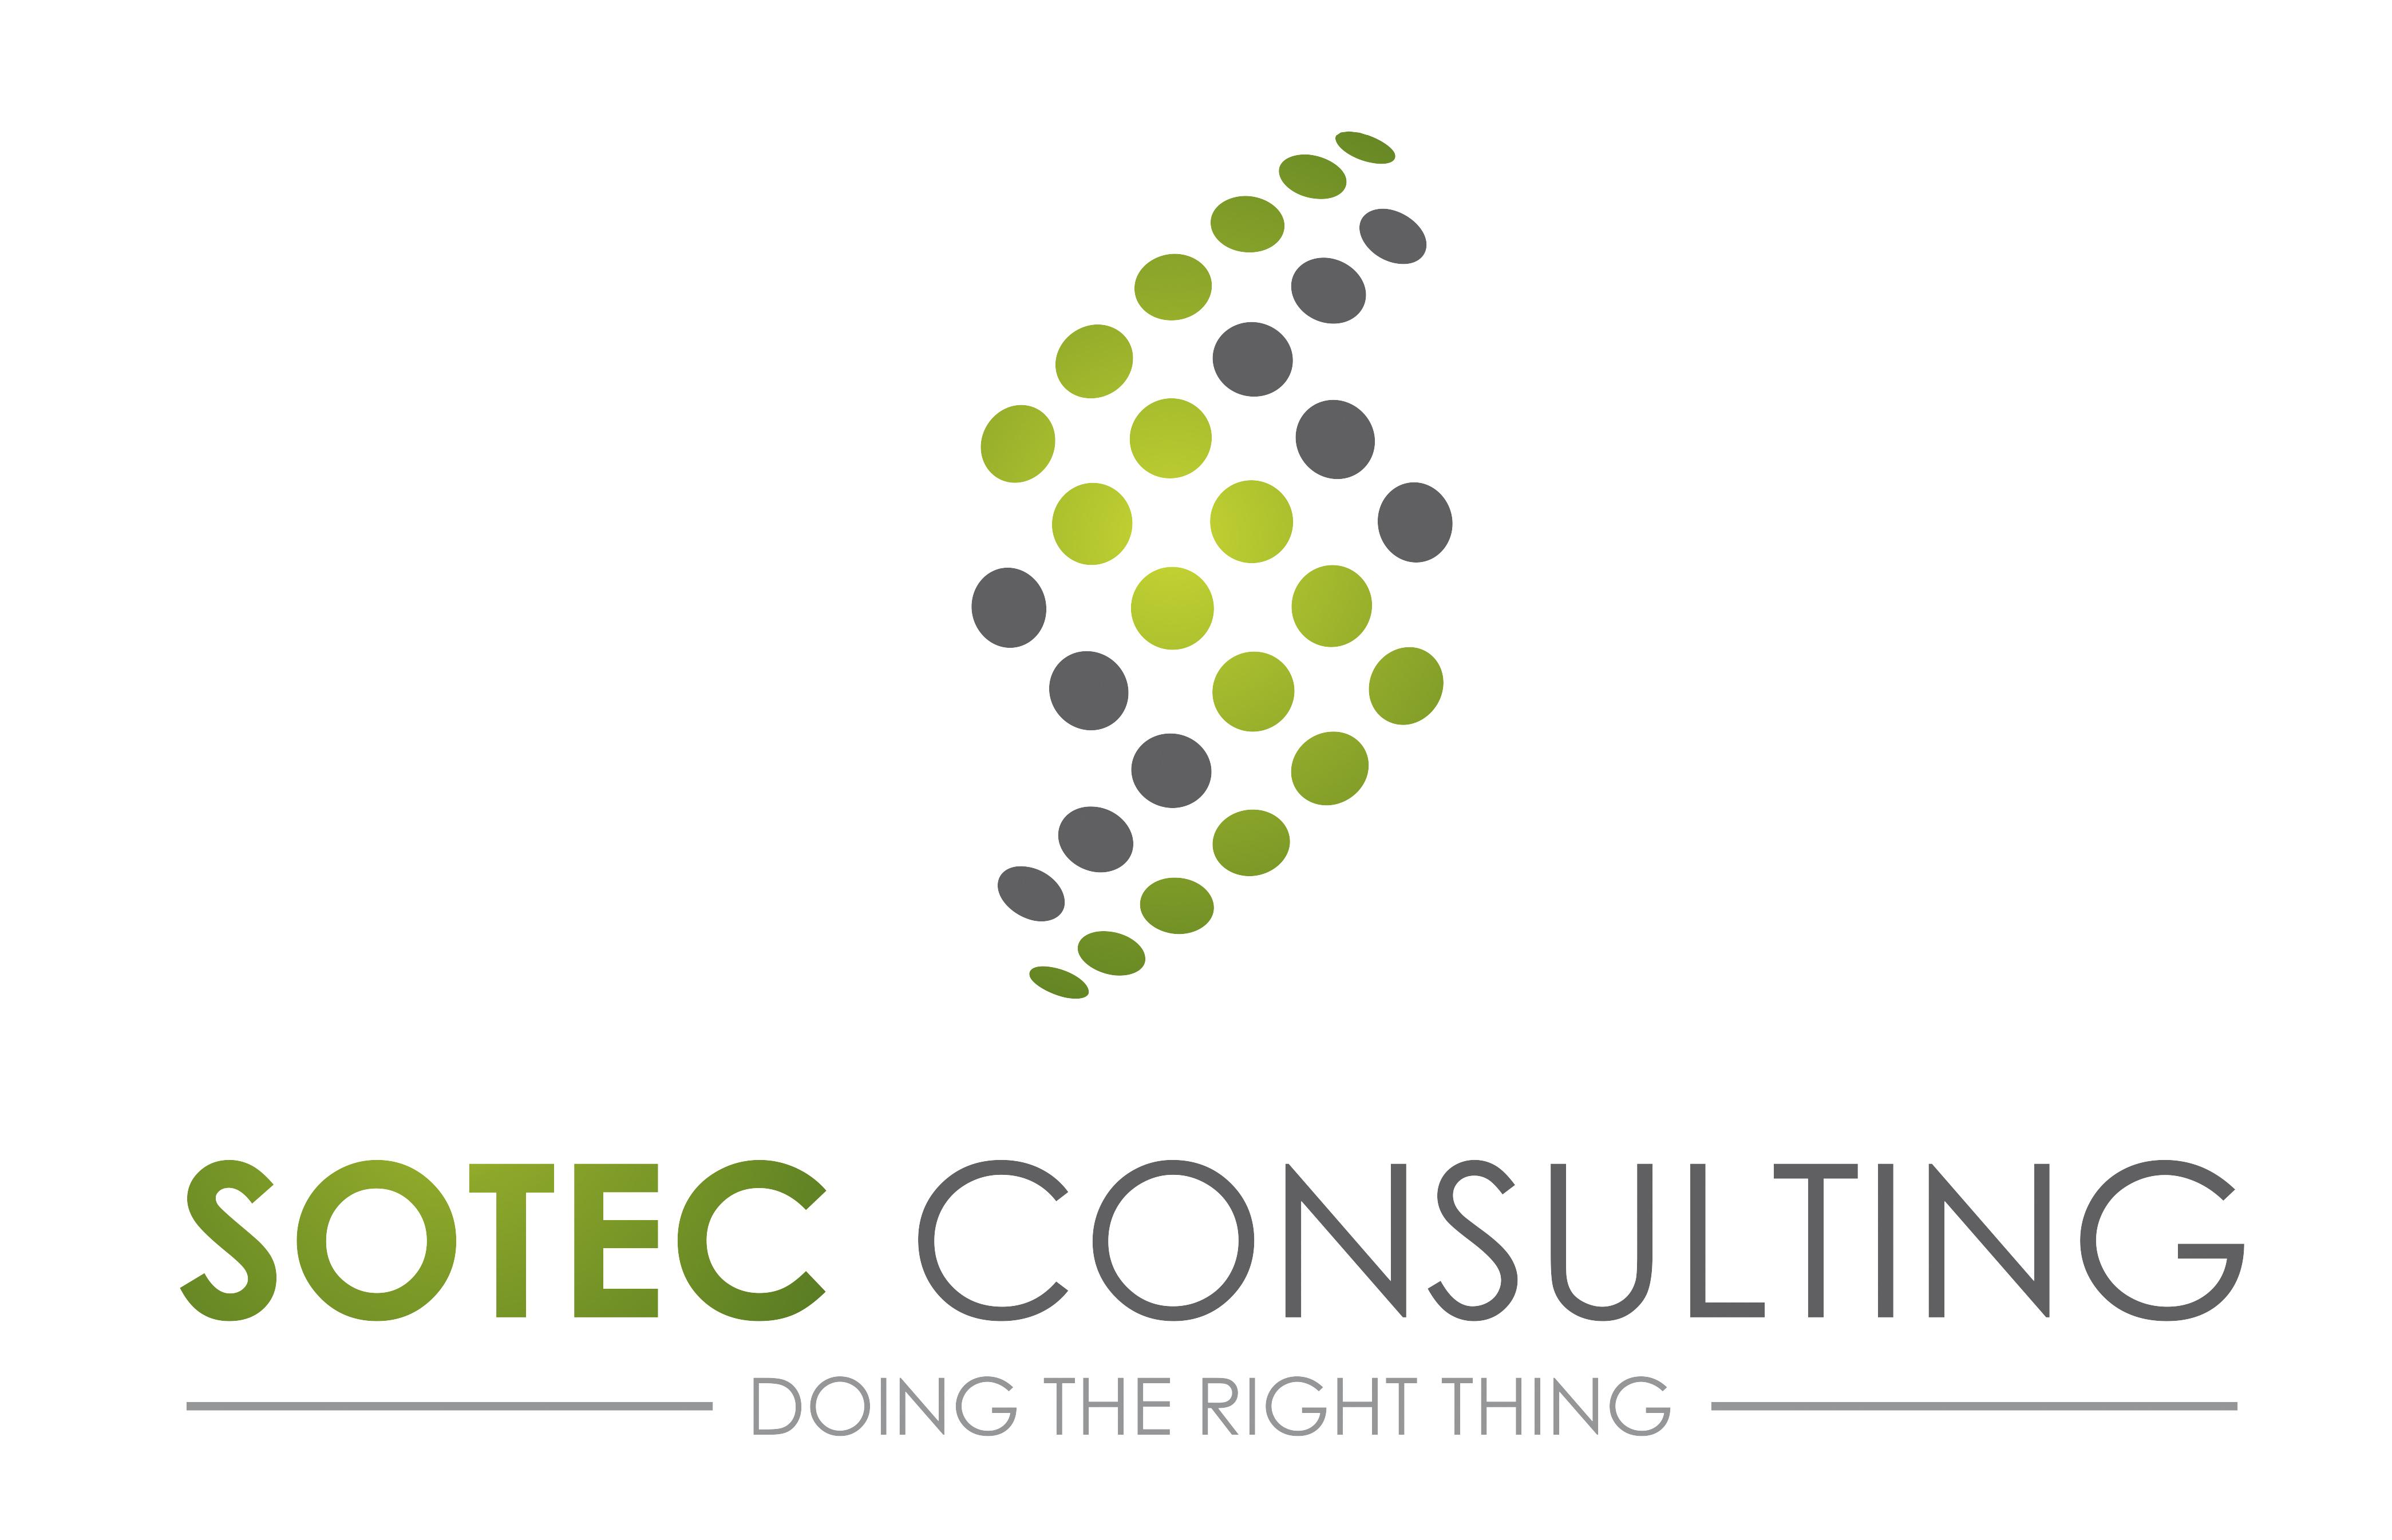 Sotec Consulting sl